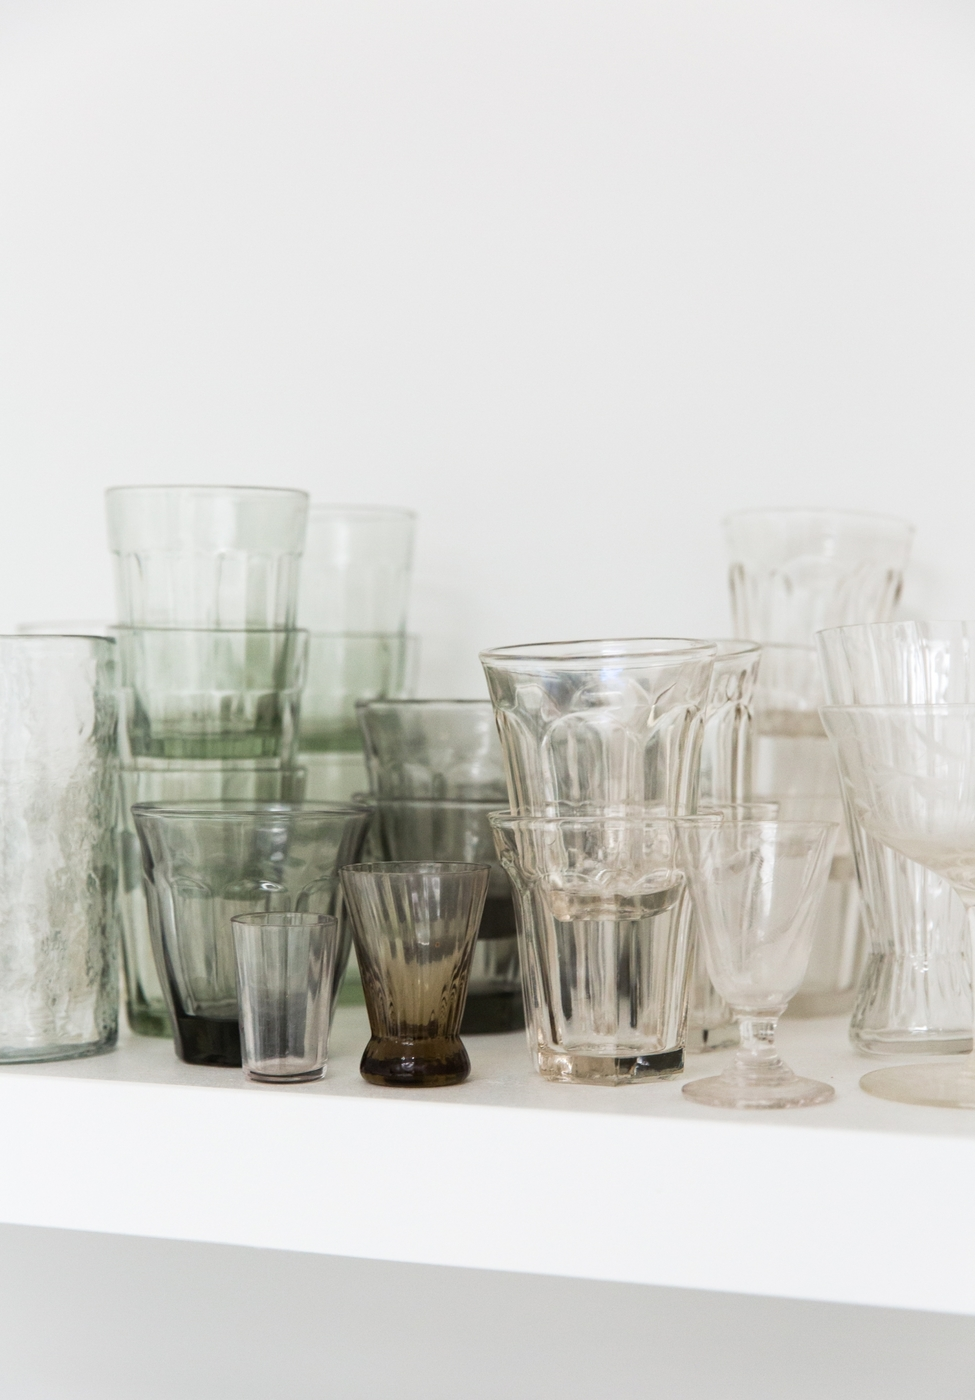 erin-scott-photo-studio-glassware-1466x2104.jpg